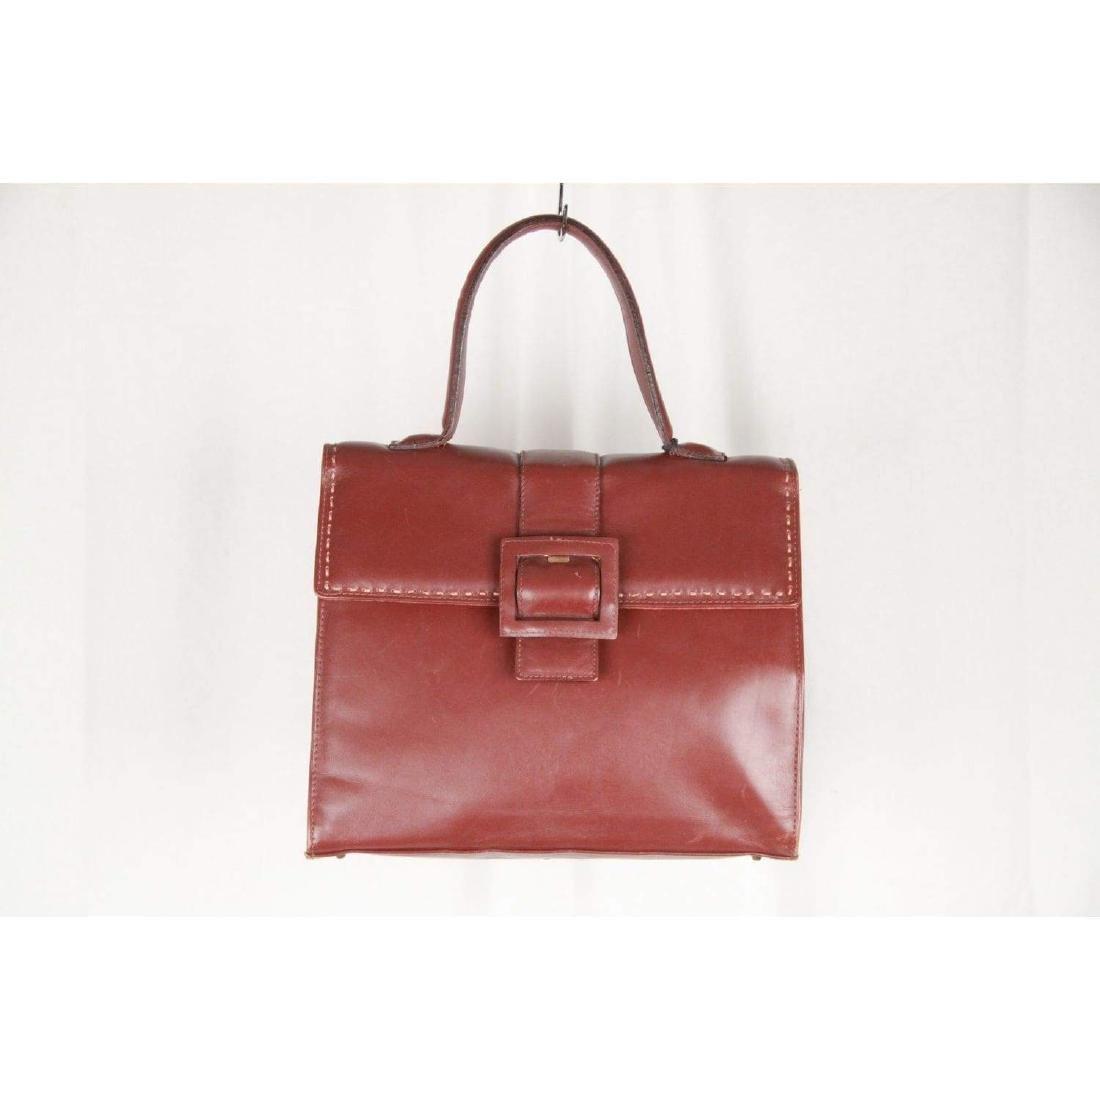 MONTENAPOLEONE Vintage Brown Leather HANDBAG - 3